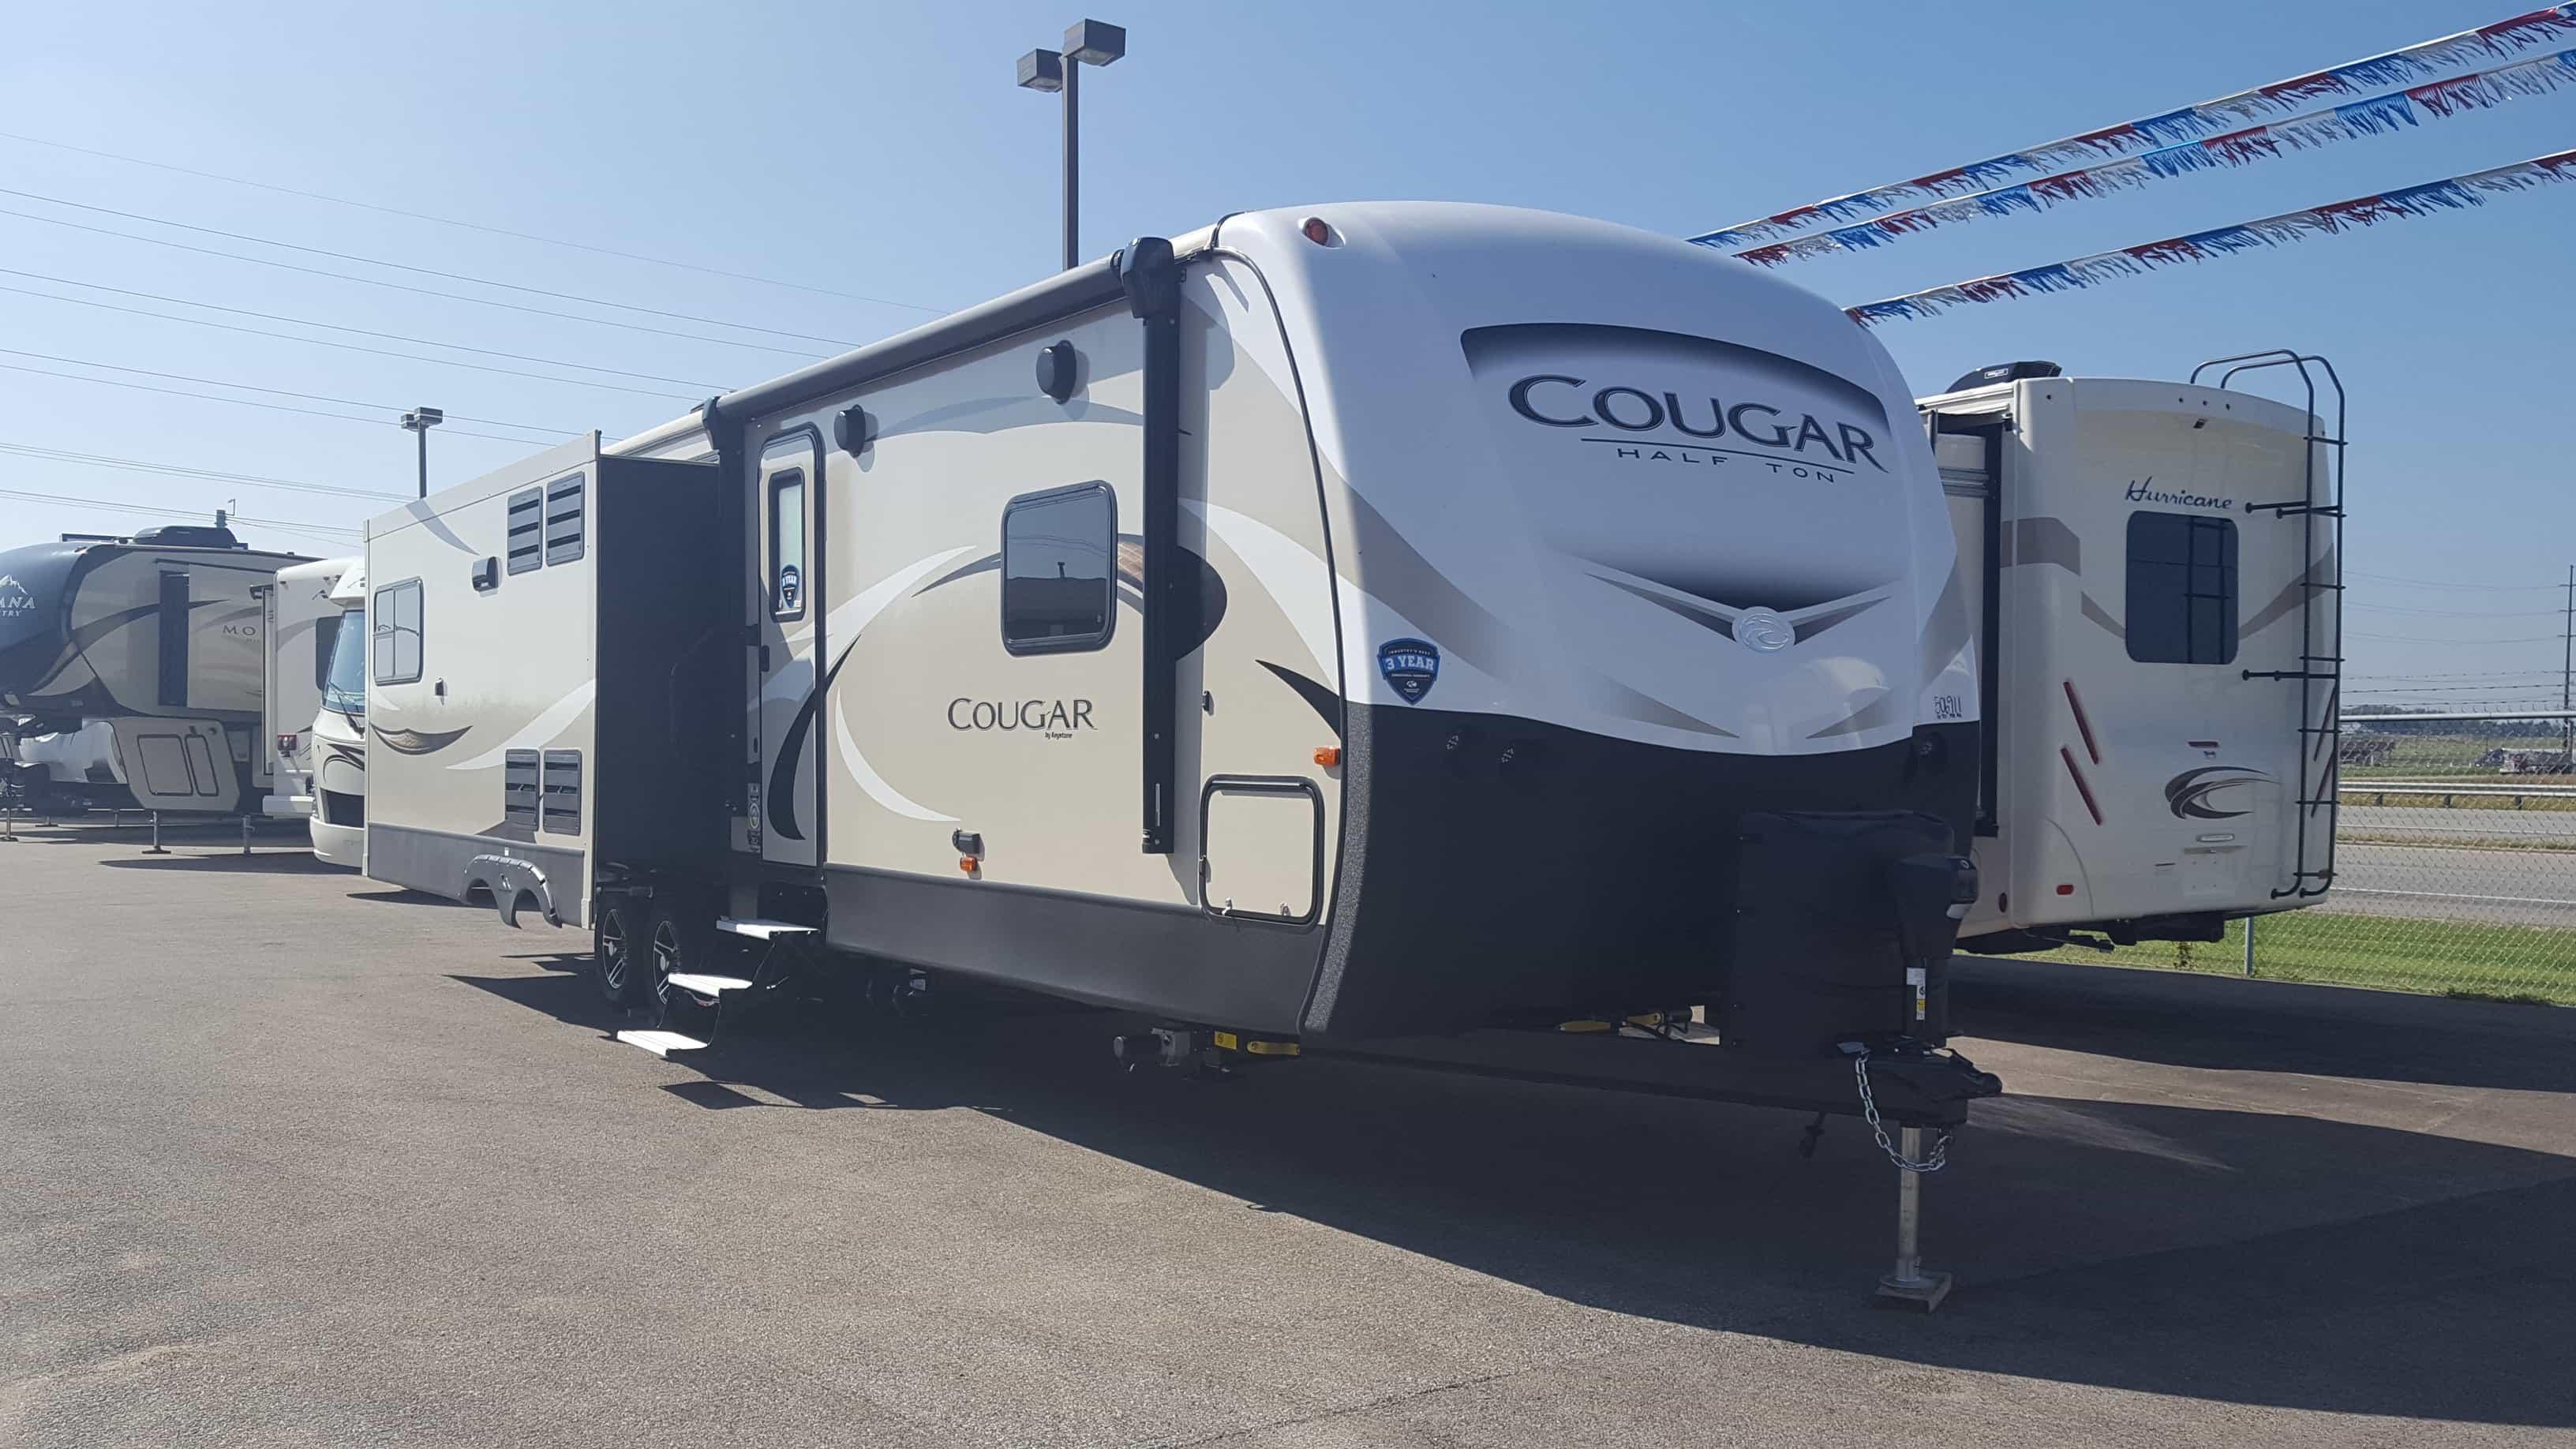 NEW 2018 Keystone COUGAR HALF-TON 33SAB - American RV